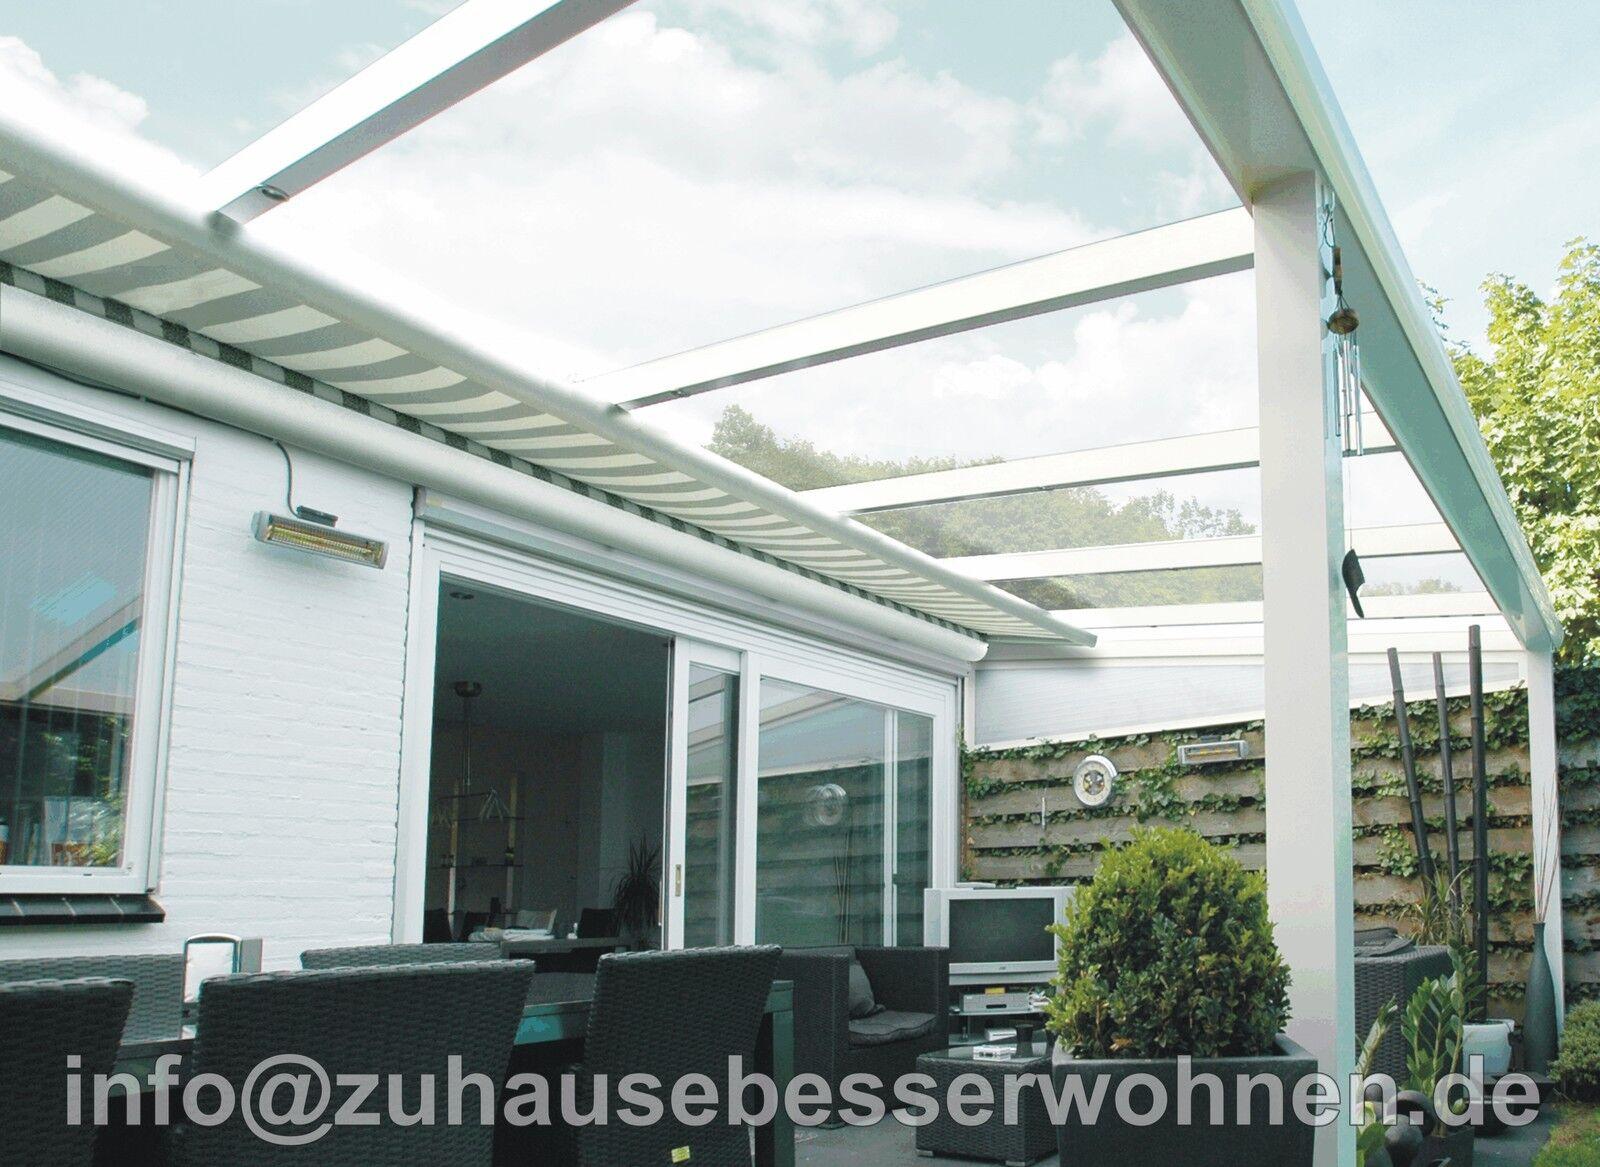 unterdachbeschattung markise f r terrassendach terrassen berdachung 4 5x3 m eur. Black Bedroom Furniture Sets. Home Design Ideas